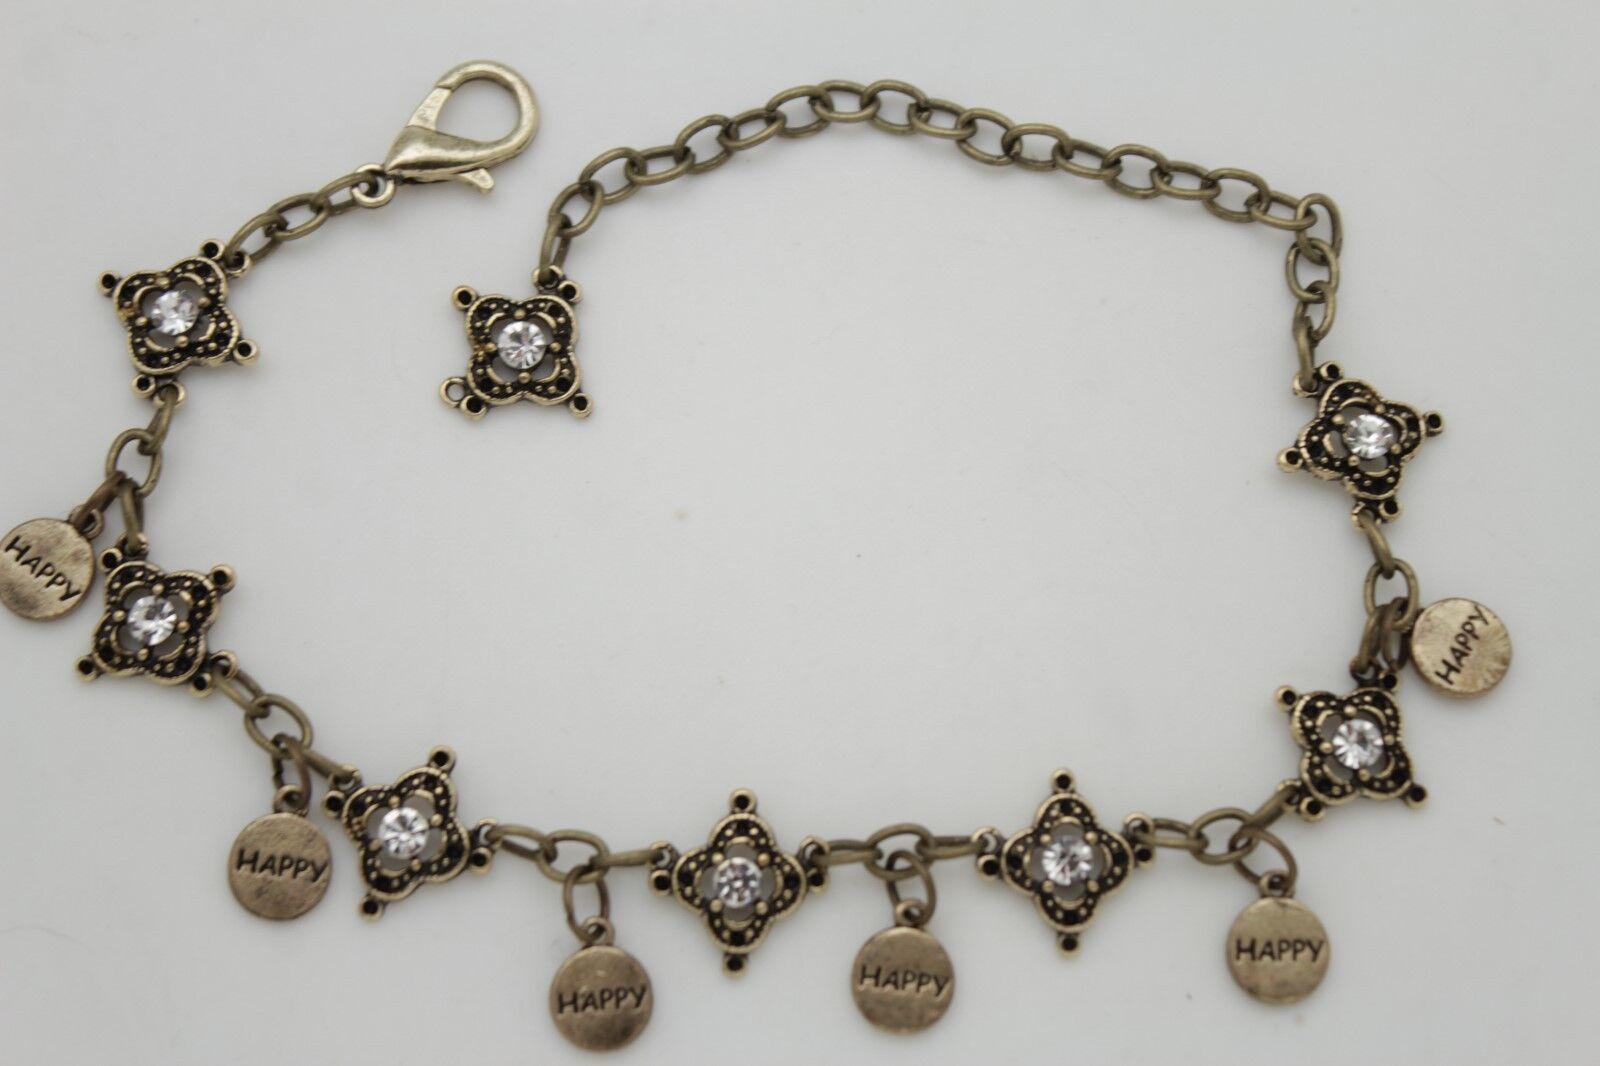 Women Biker Boot Bracelet Antique Gold Metal Chain Link Anklet Shoe Happy Charms